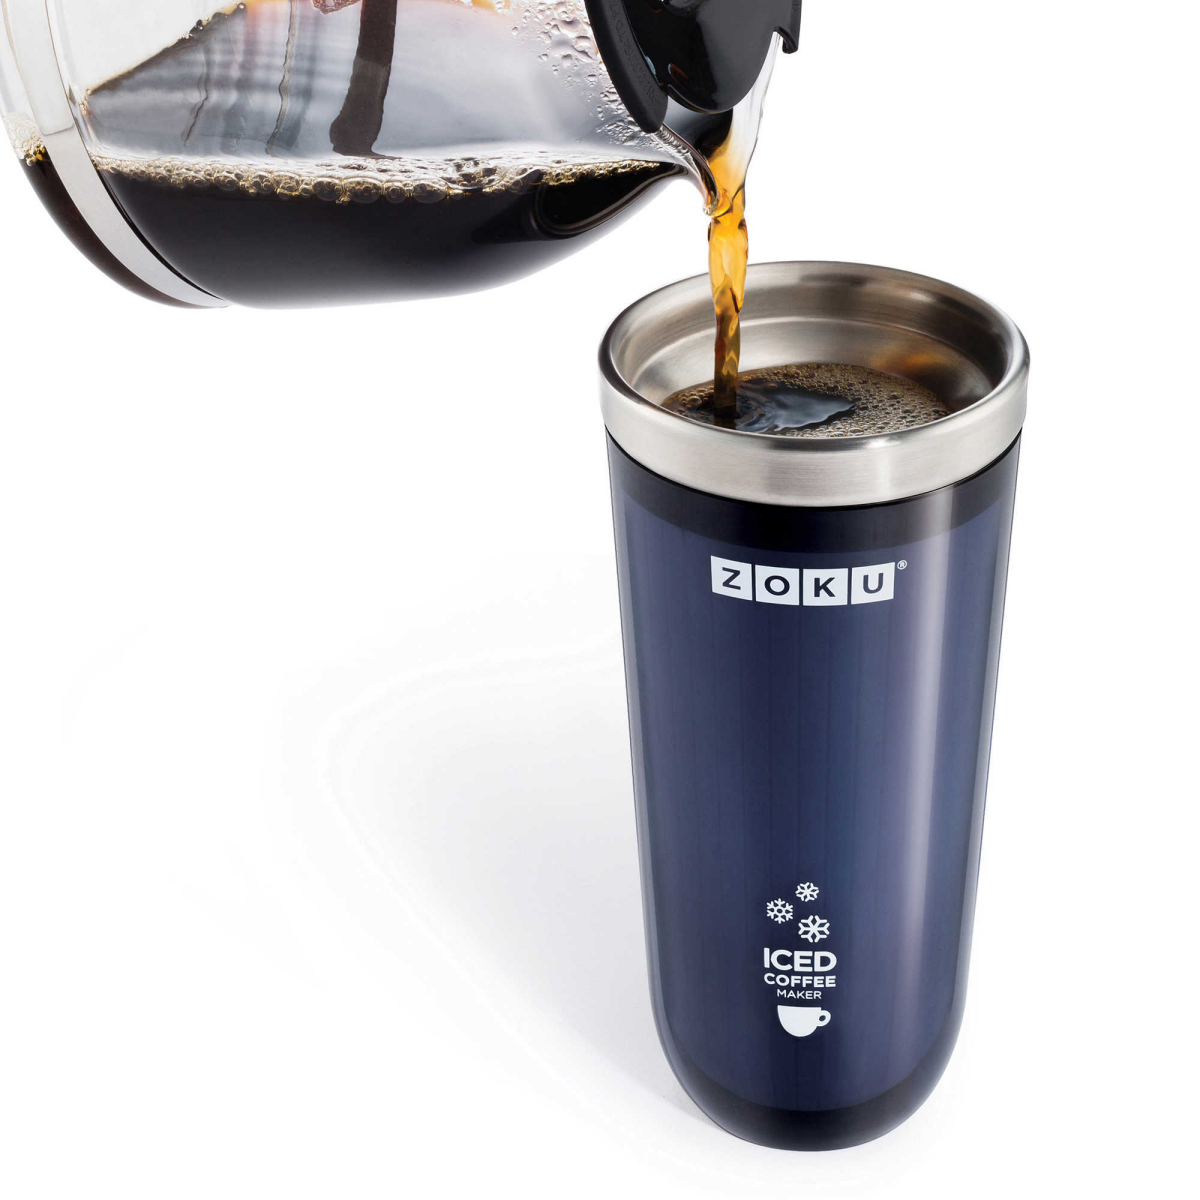 EC:  assets%2Fmessage-editor%2F1480472676809-icedcoffeemaker